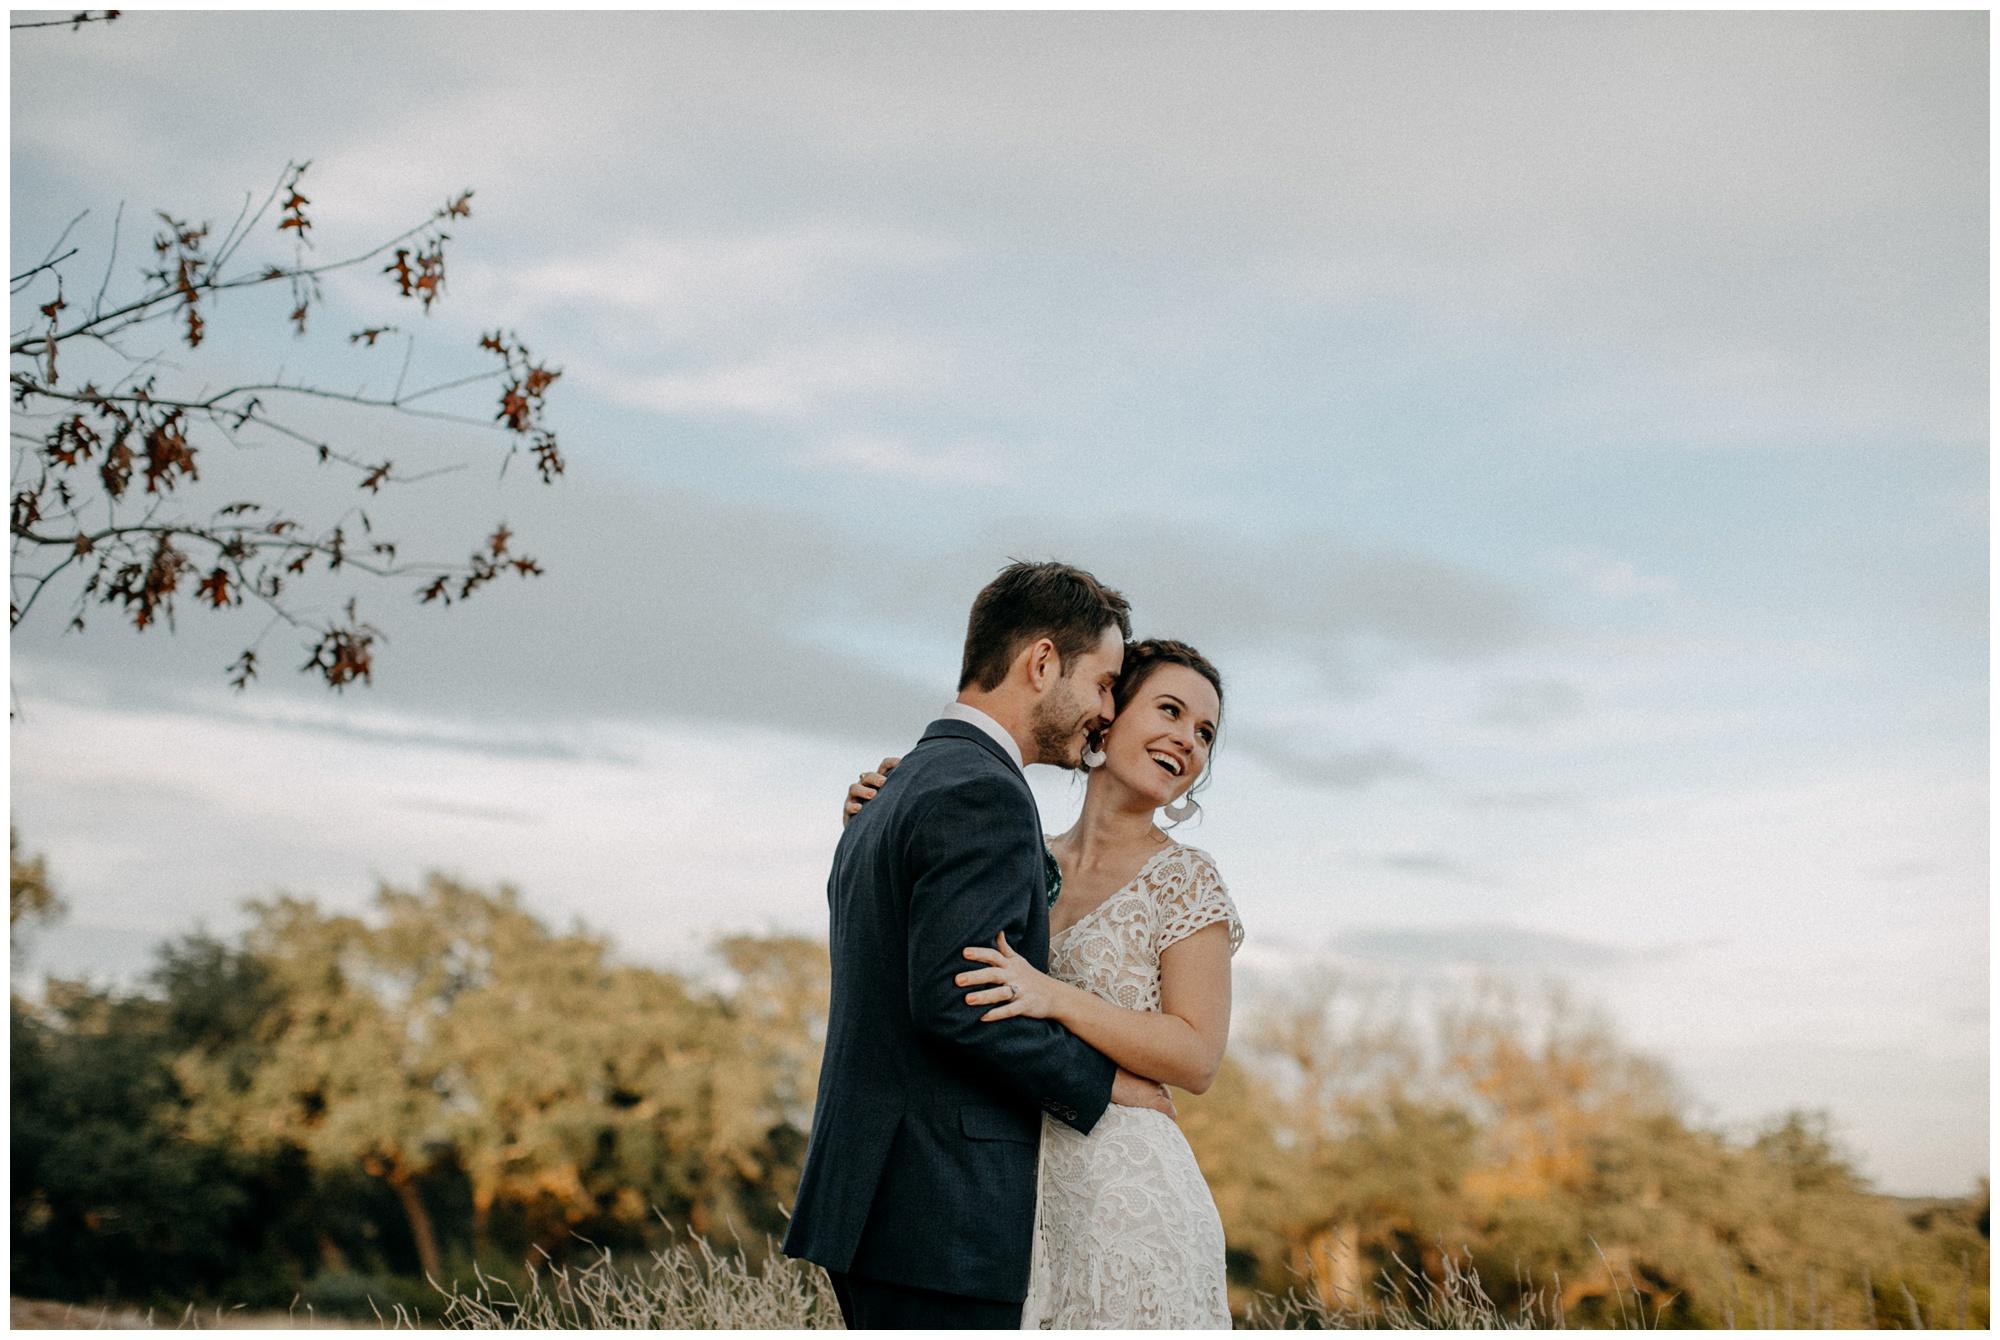 AUSTIN-TEXAS-PROSPECT-HOUSE-WEDDING-VENUE-PHOTOGRAPHY25829.JPG